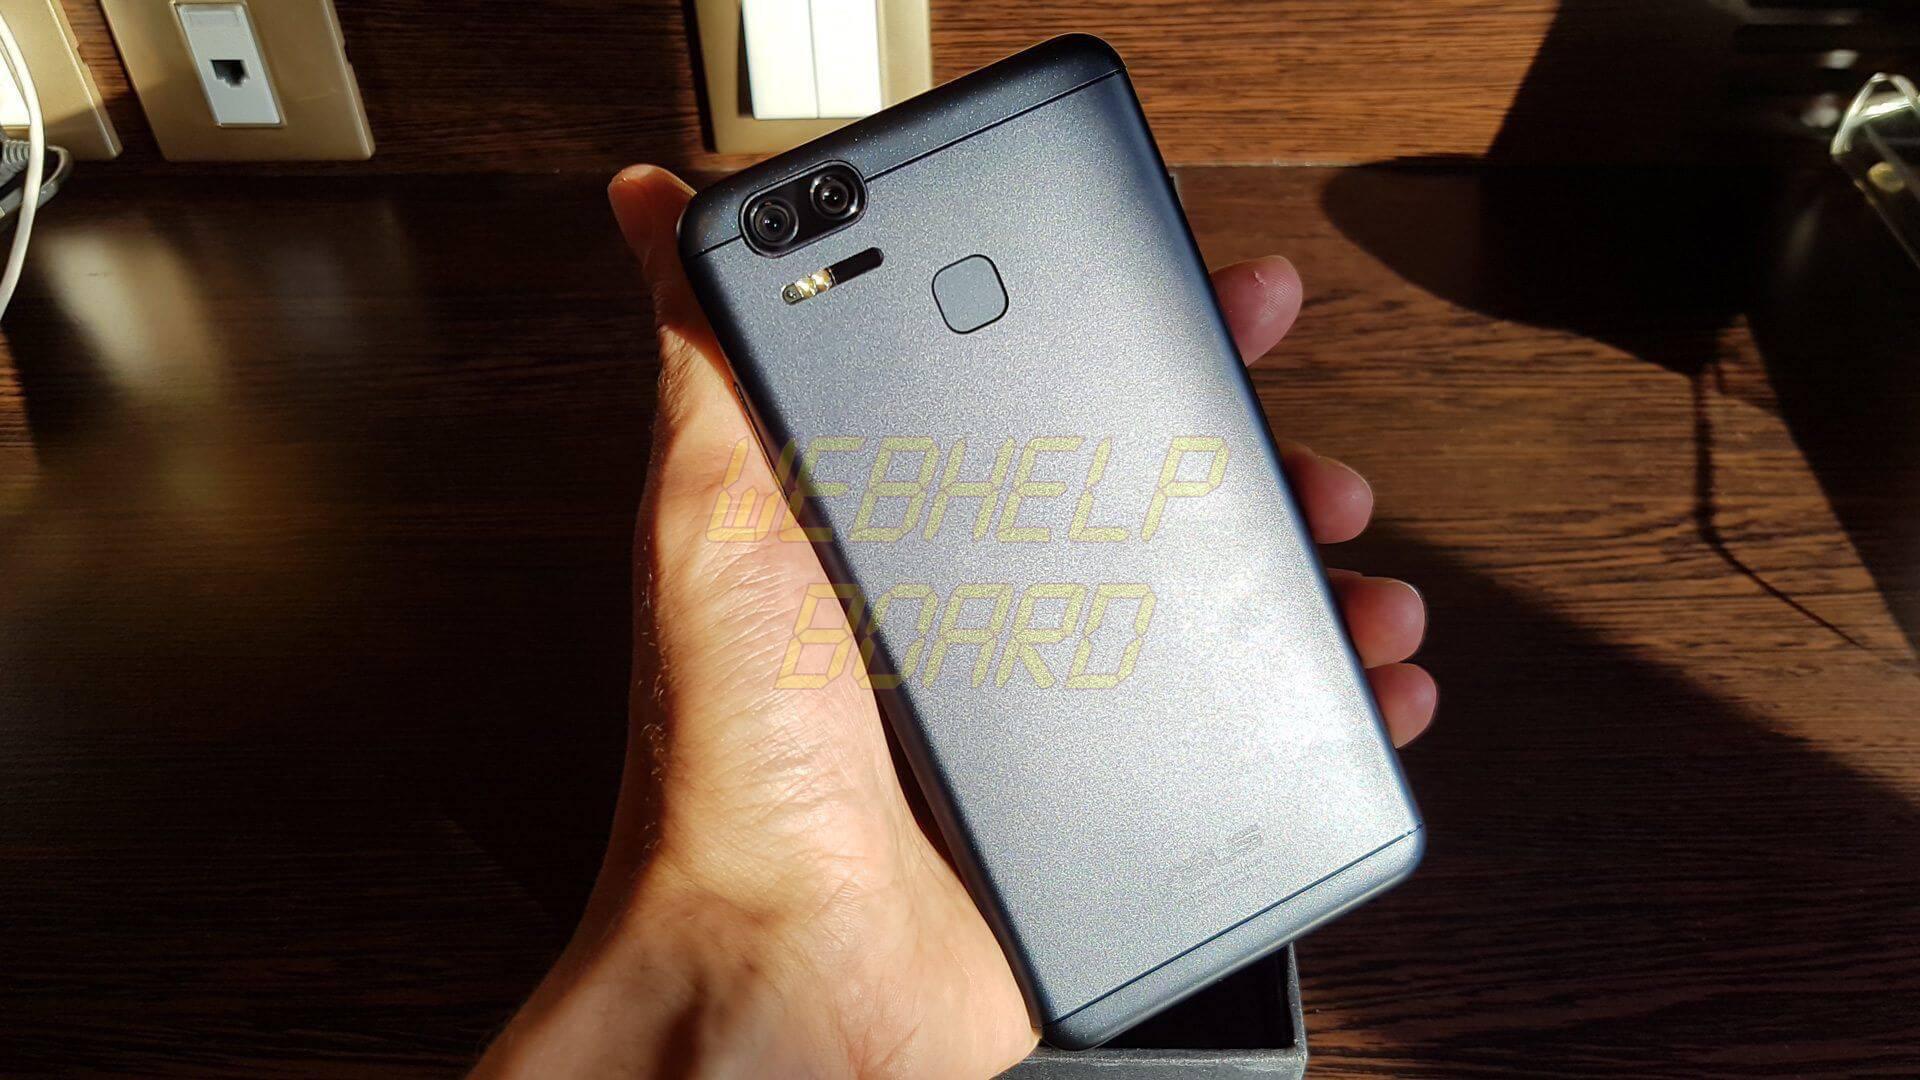 Layout ZenFone 3 ZOOM - Dicas e truques para o Zenfone 3 Zoom